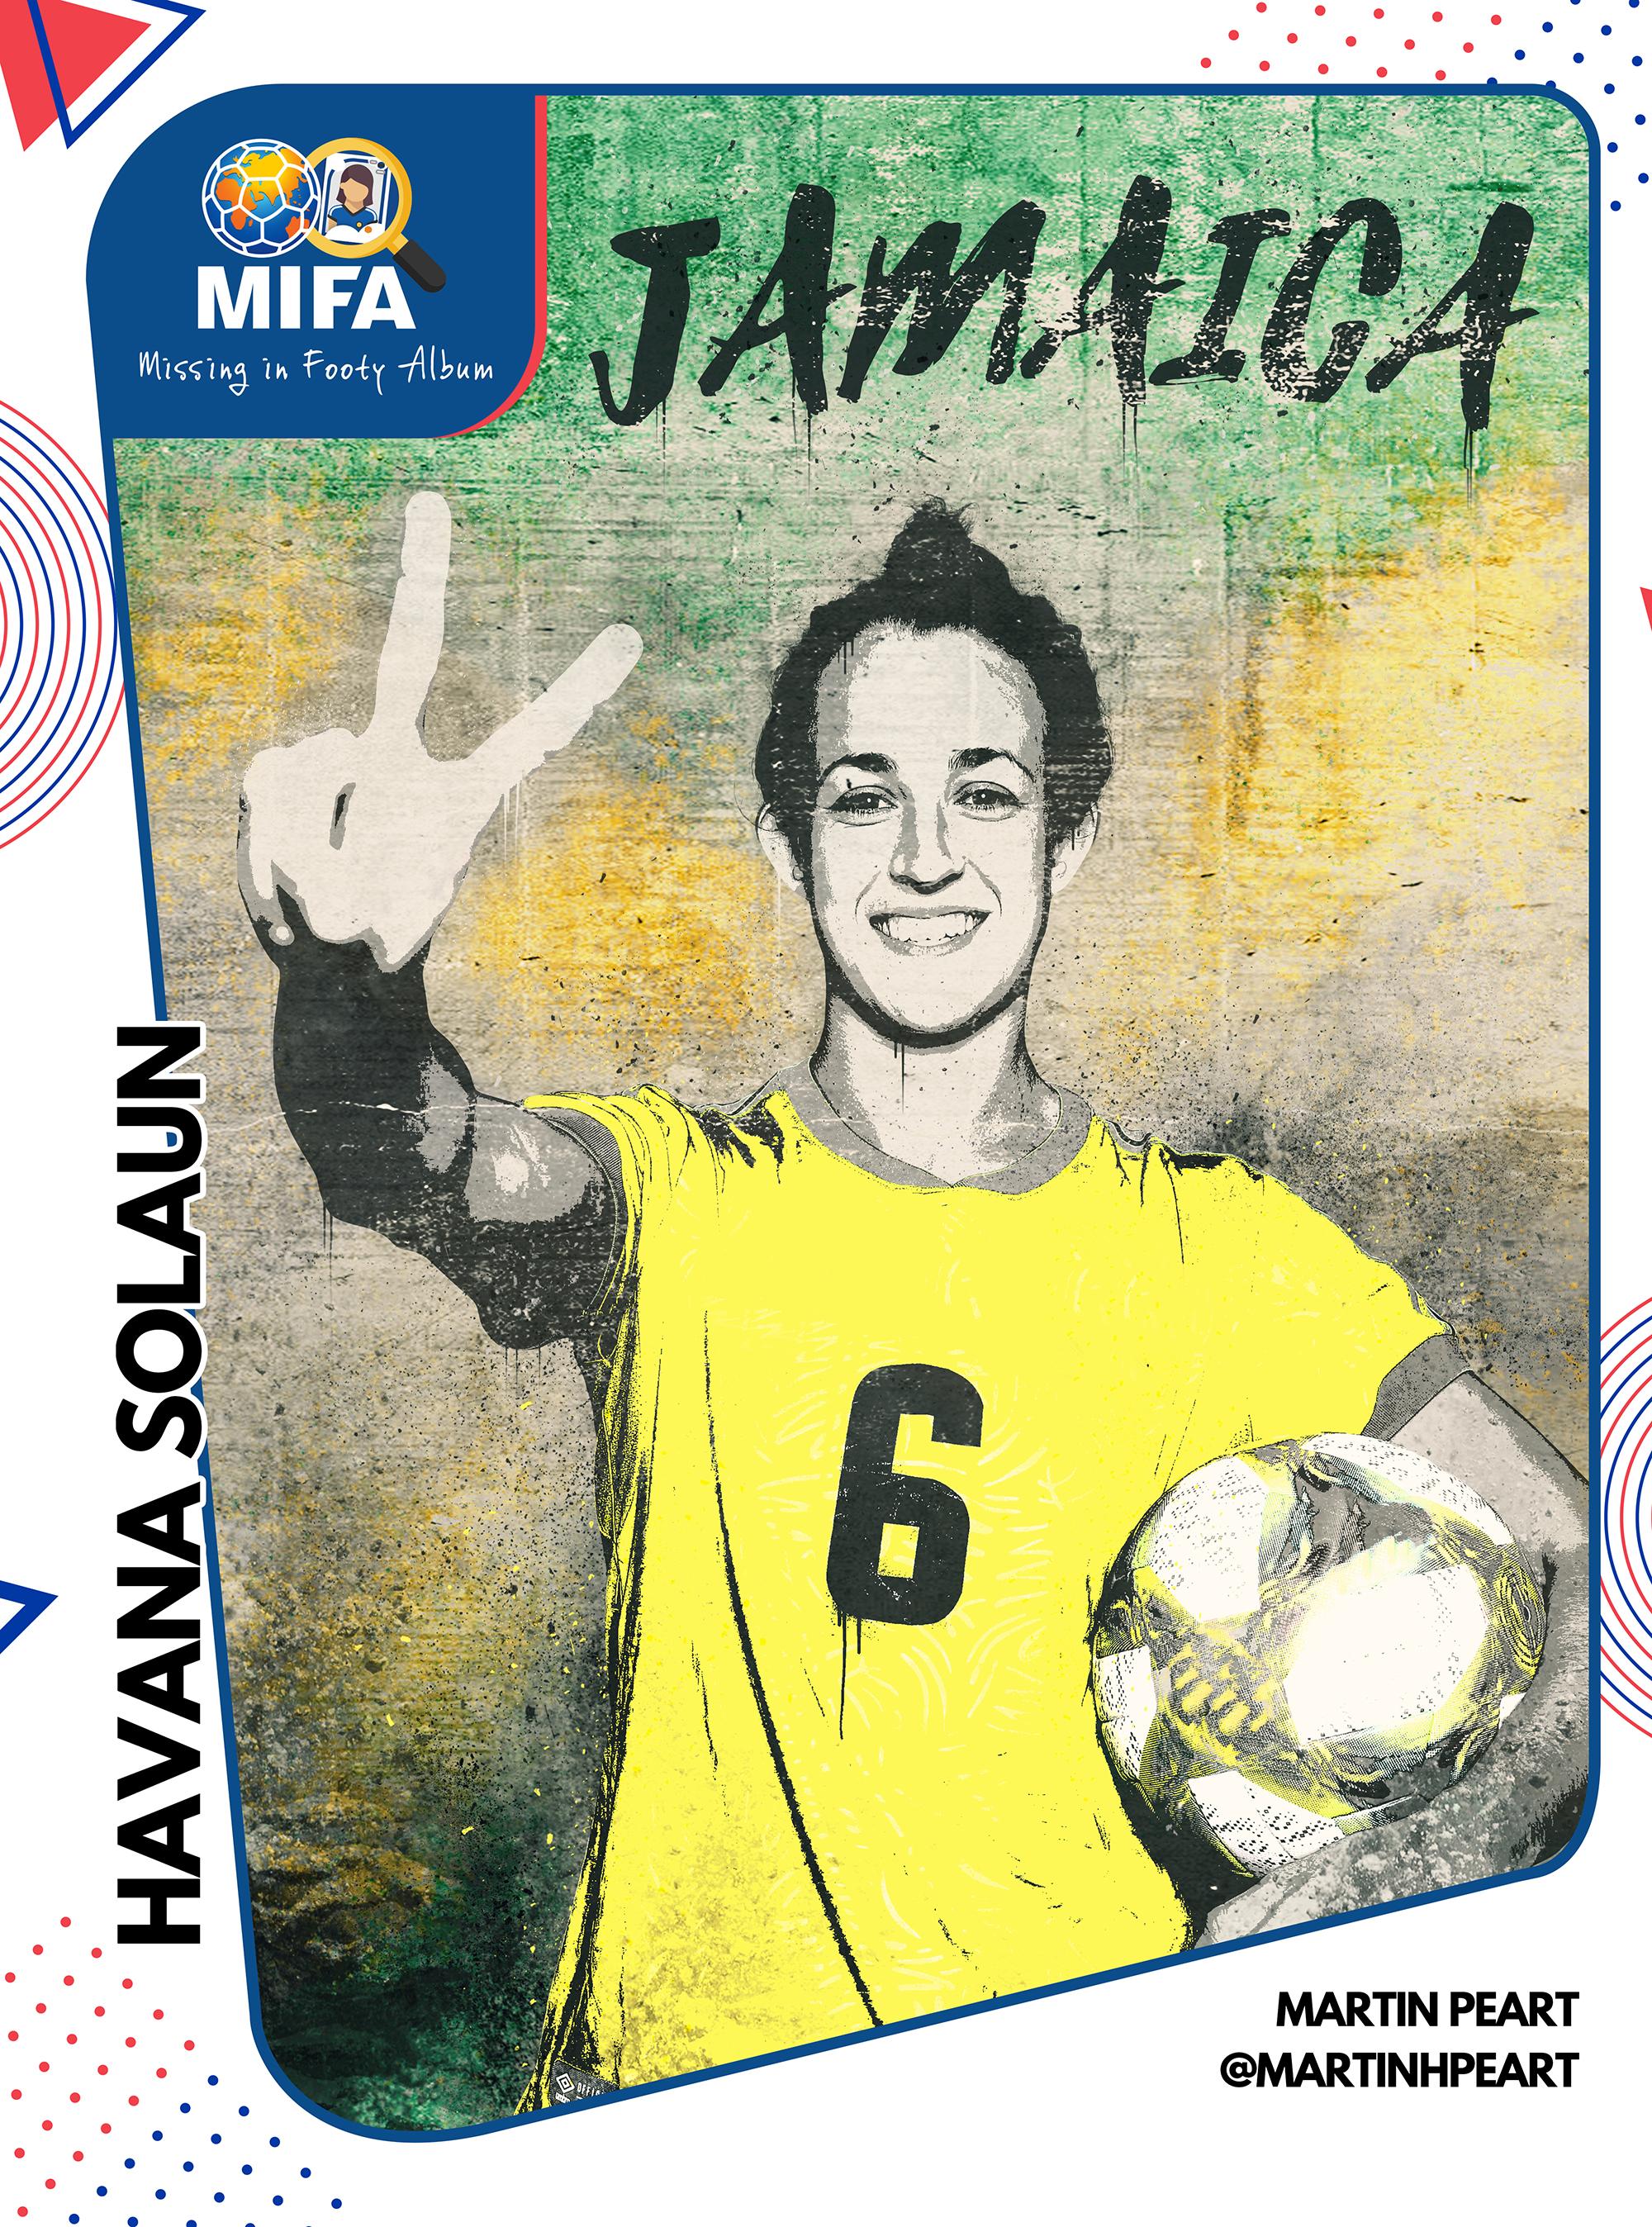 MIFA-2019-HAVANA-SOLAUN.jpg